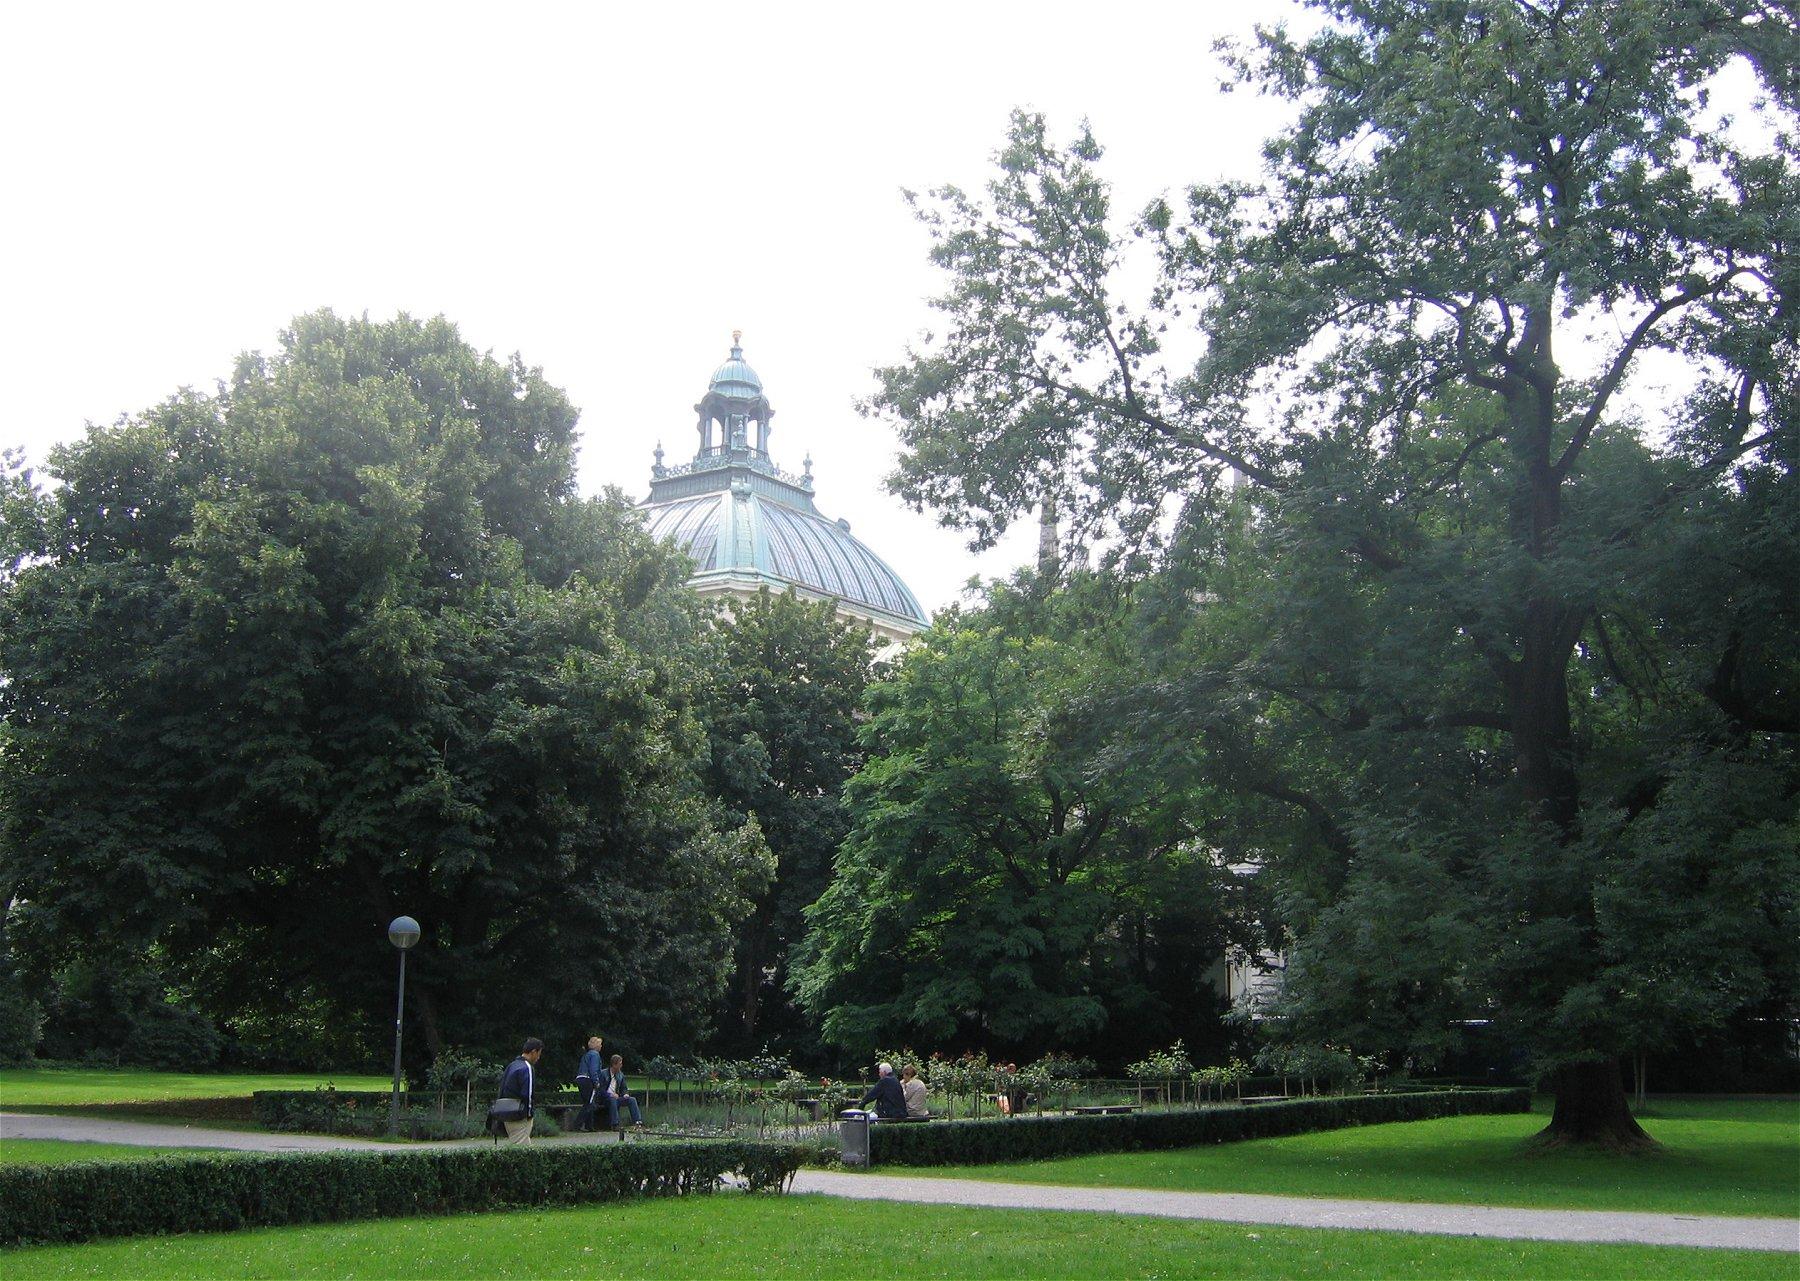 File Alter Botanischer Garten Muenchen 1 jpg Wikimedia Commons